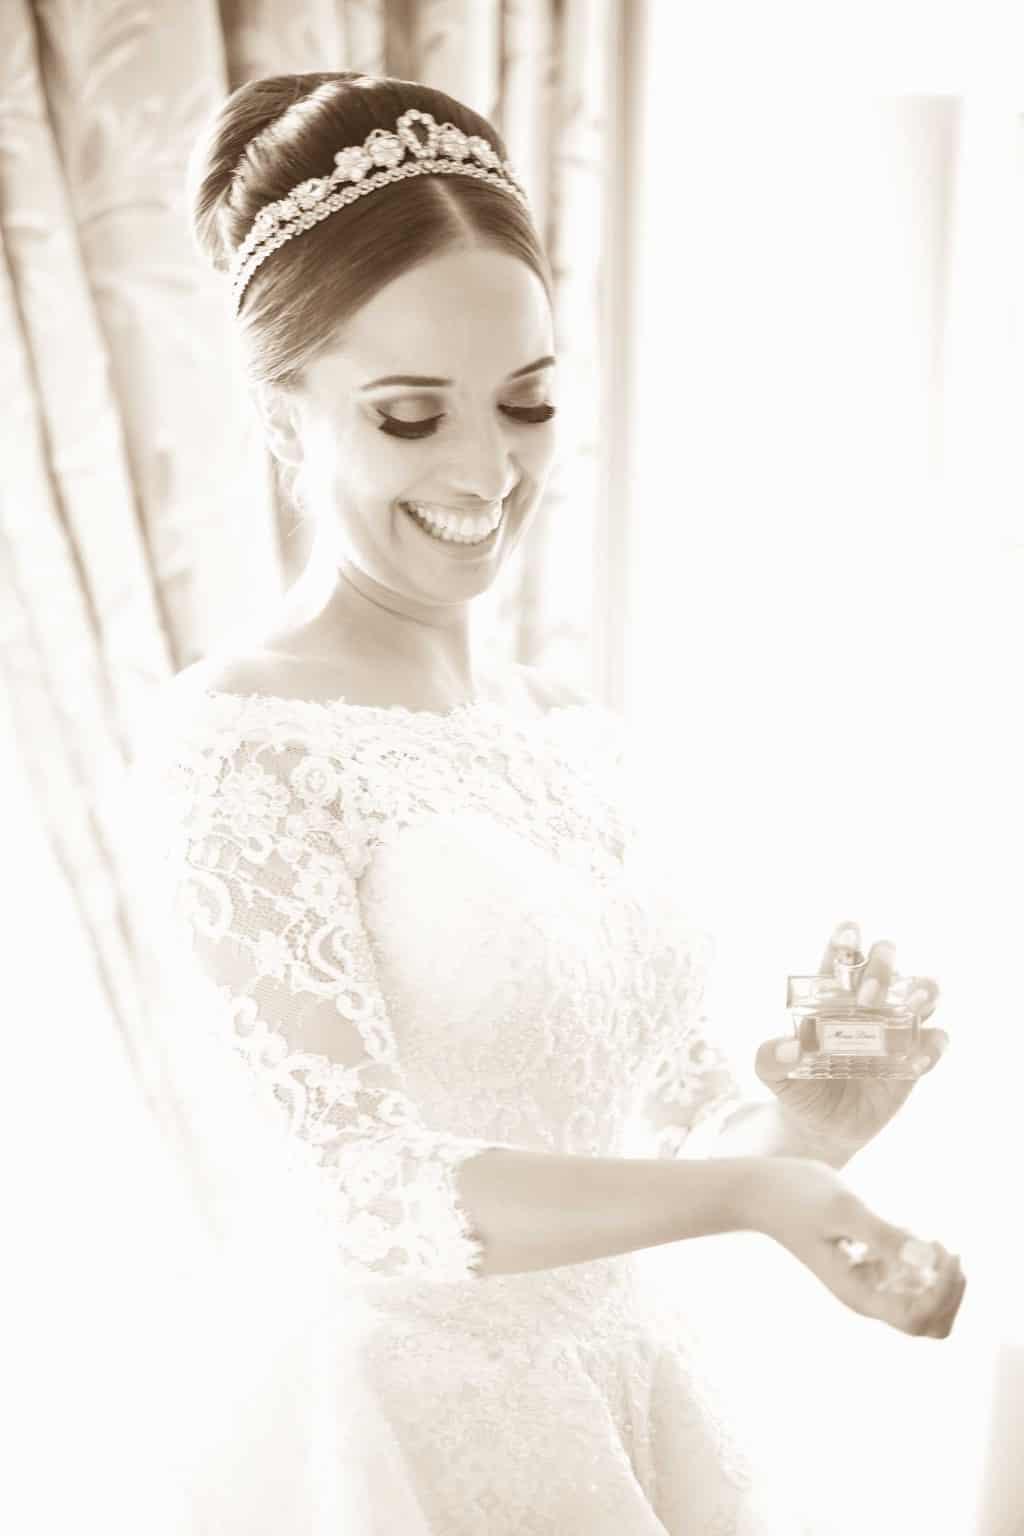 Casamento-Clássico-Casamento-tradicional-Copacabana-Palace-Monica-Roias-perfume-Ribas-Foto-e-Vídeo-Tuanny-e-Bernardo-CaseMe